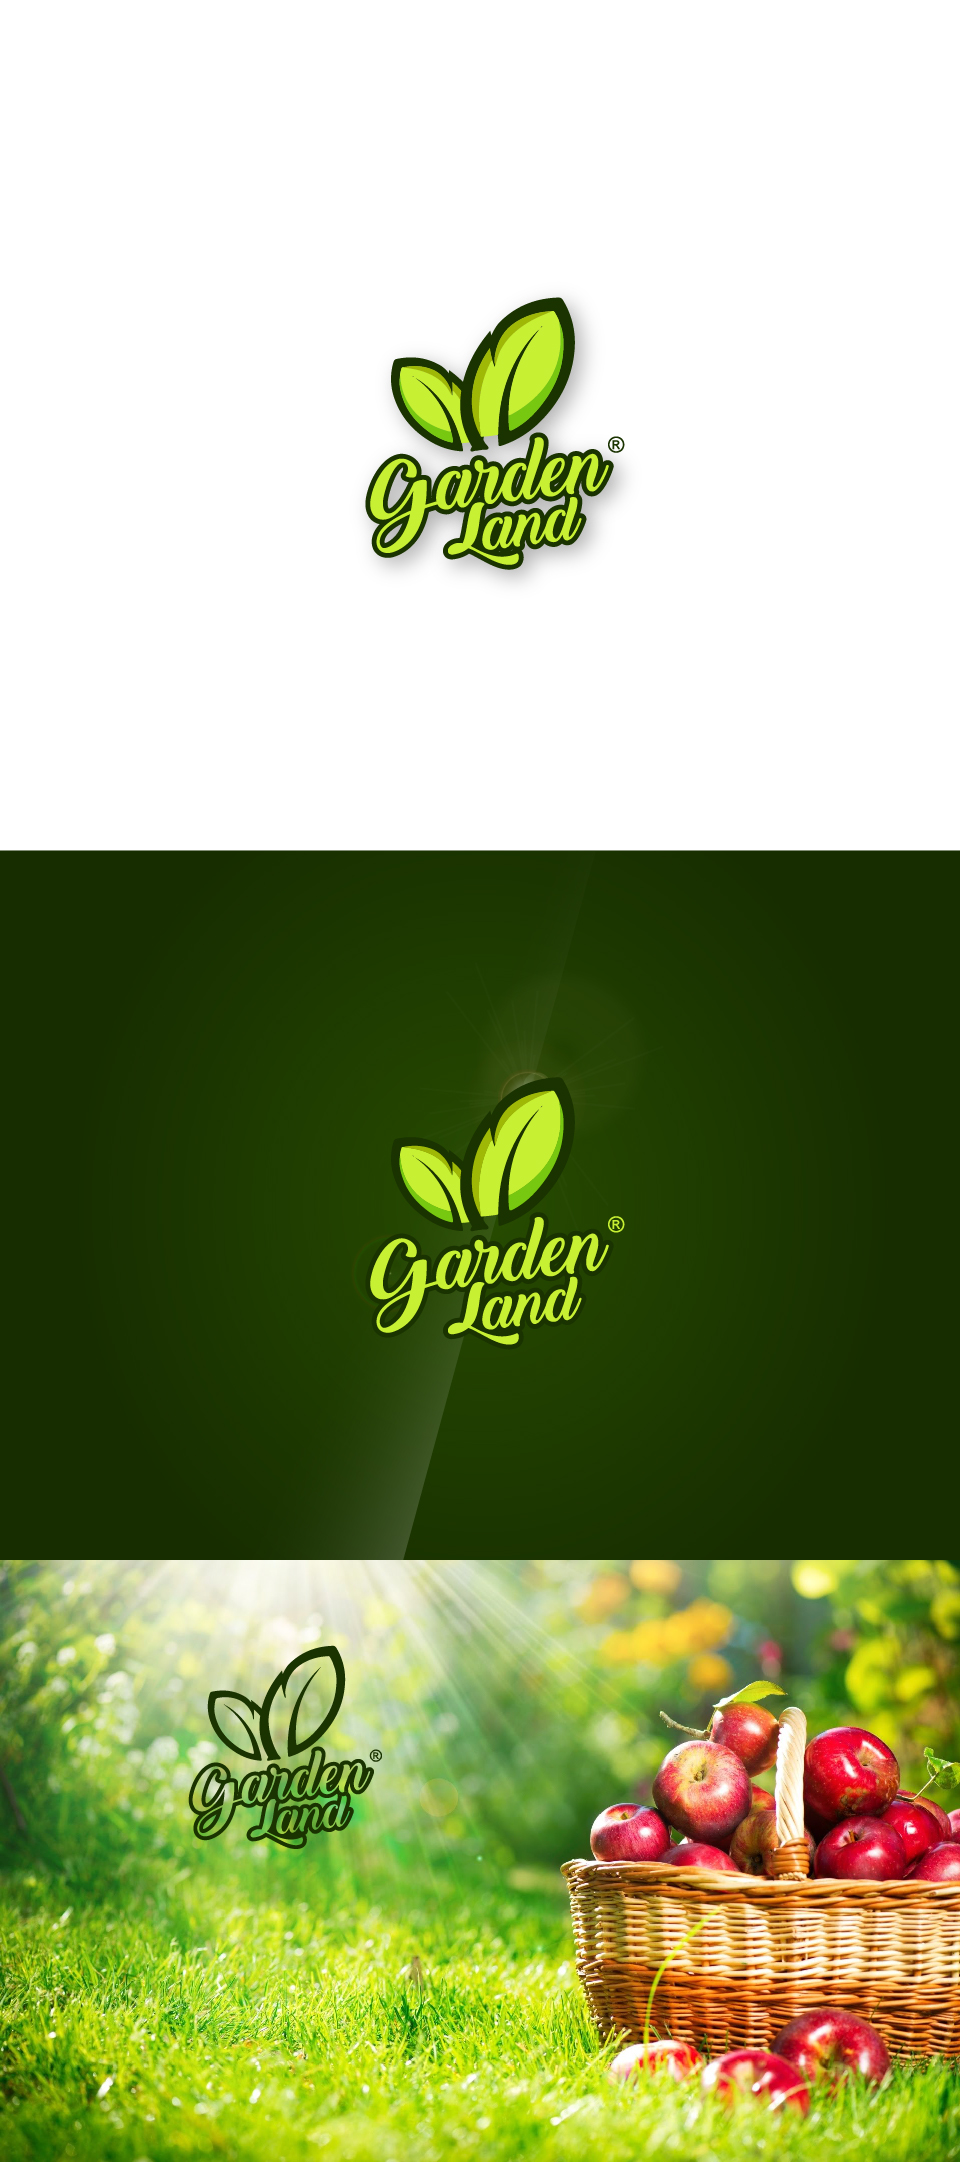 Создание логотипа компании Garden.Land фото f_14559843ee0cd08b.jpg